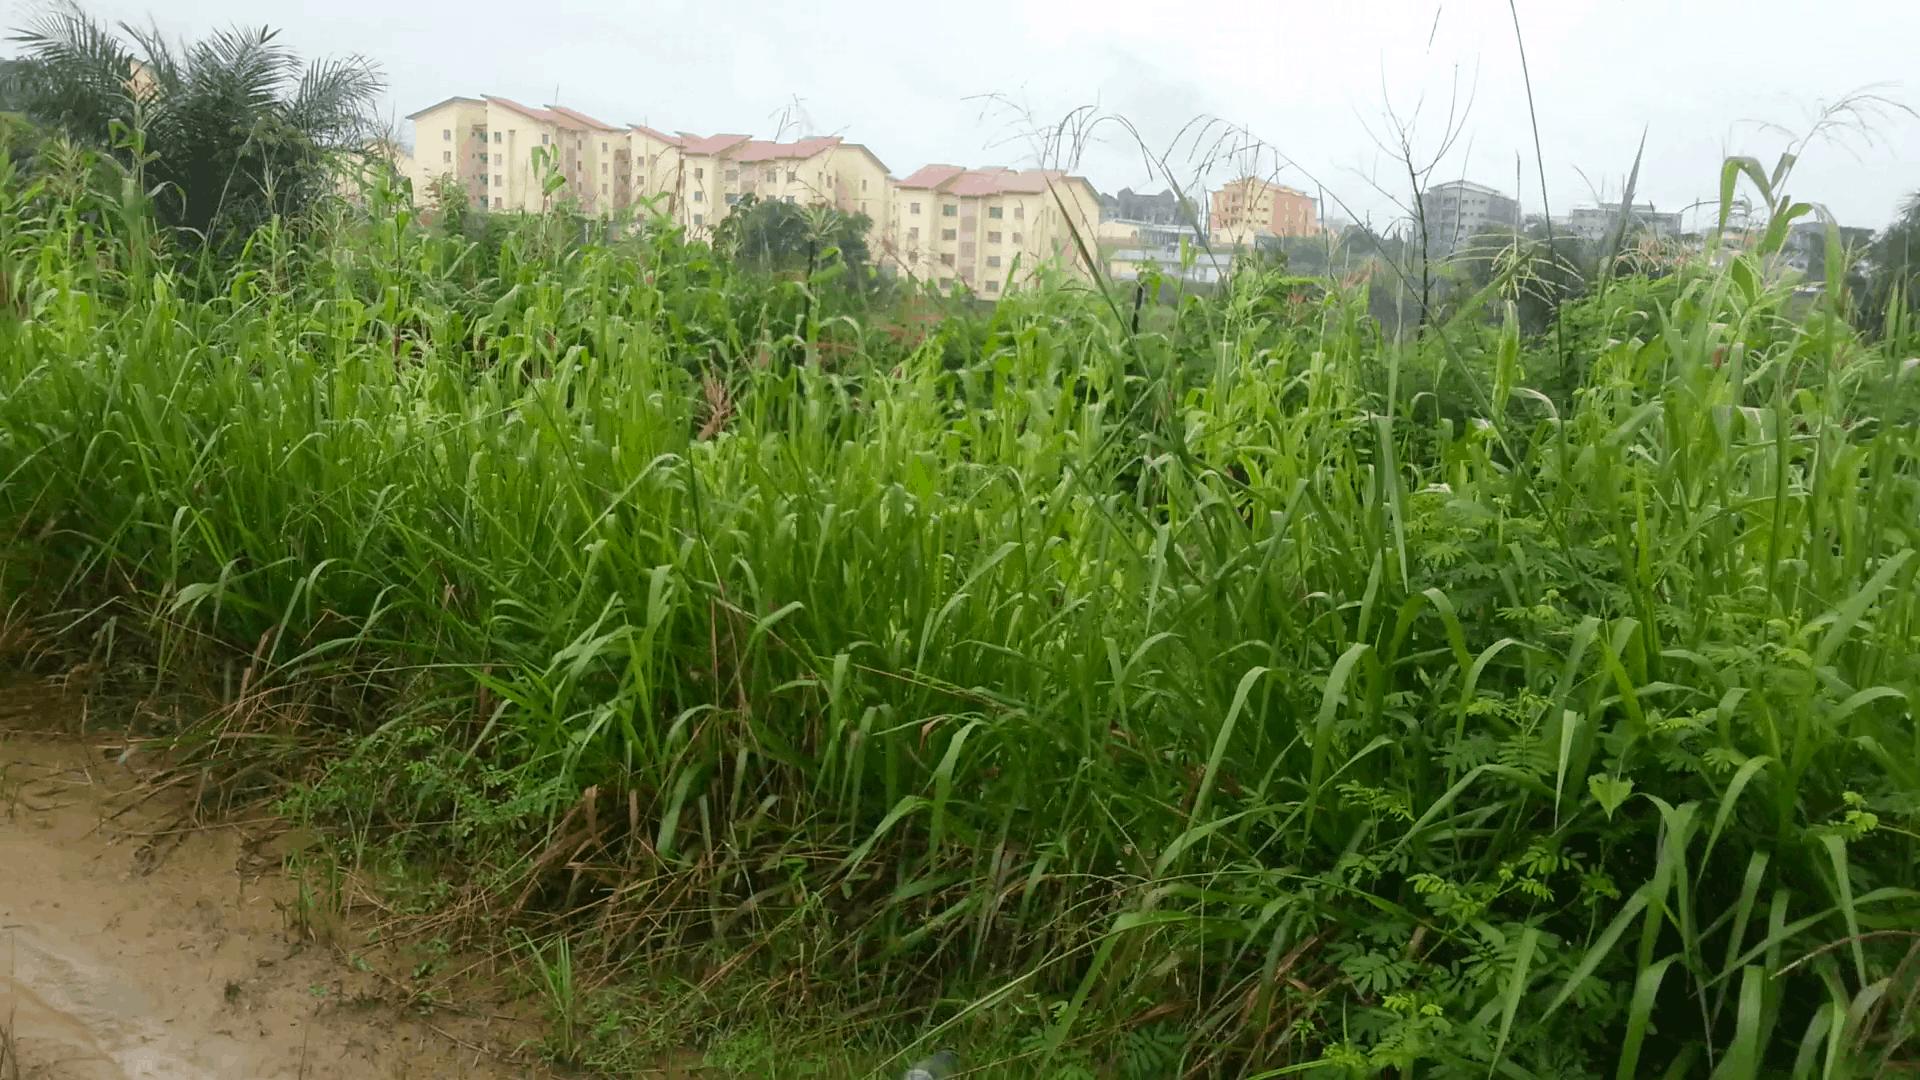 Land for sale at Douala, Yassa, Maetur - 2000 m2 - 100 000 000 FCFA